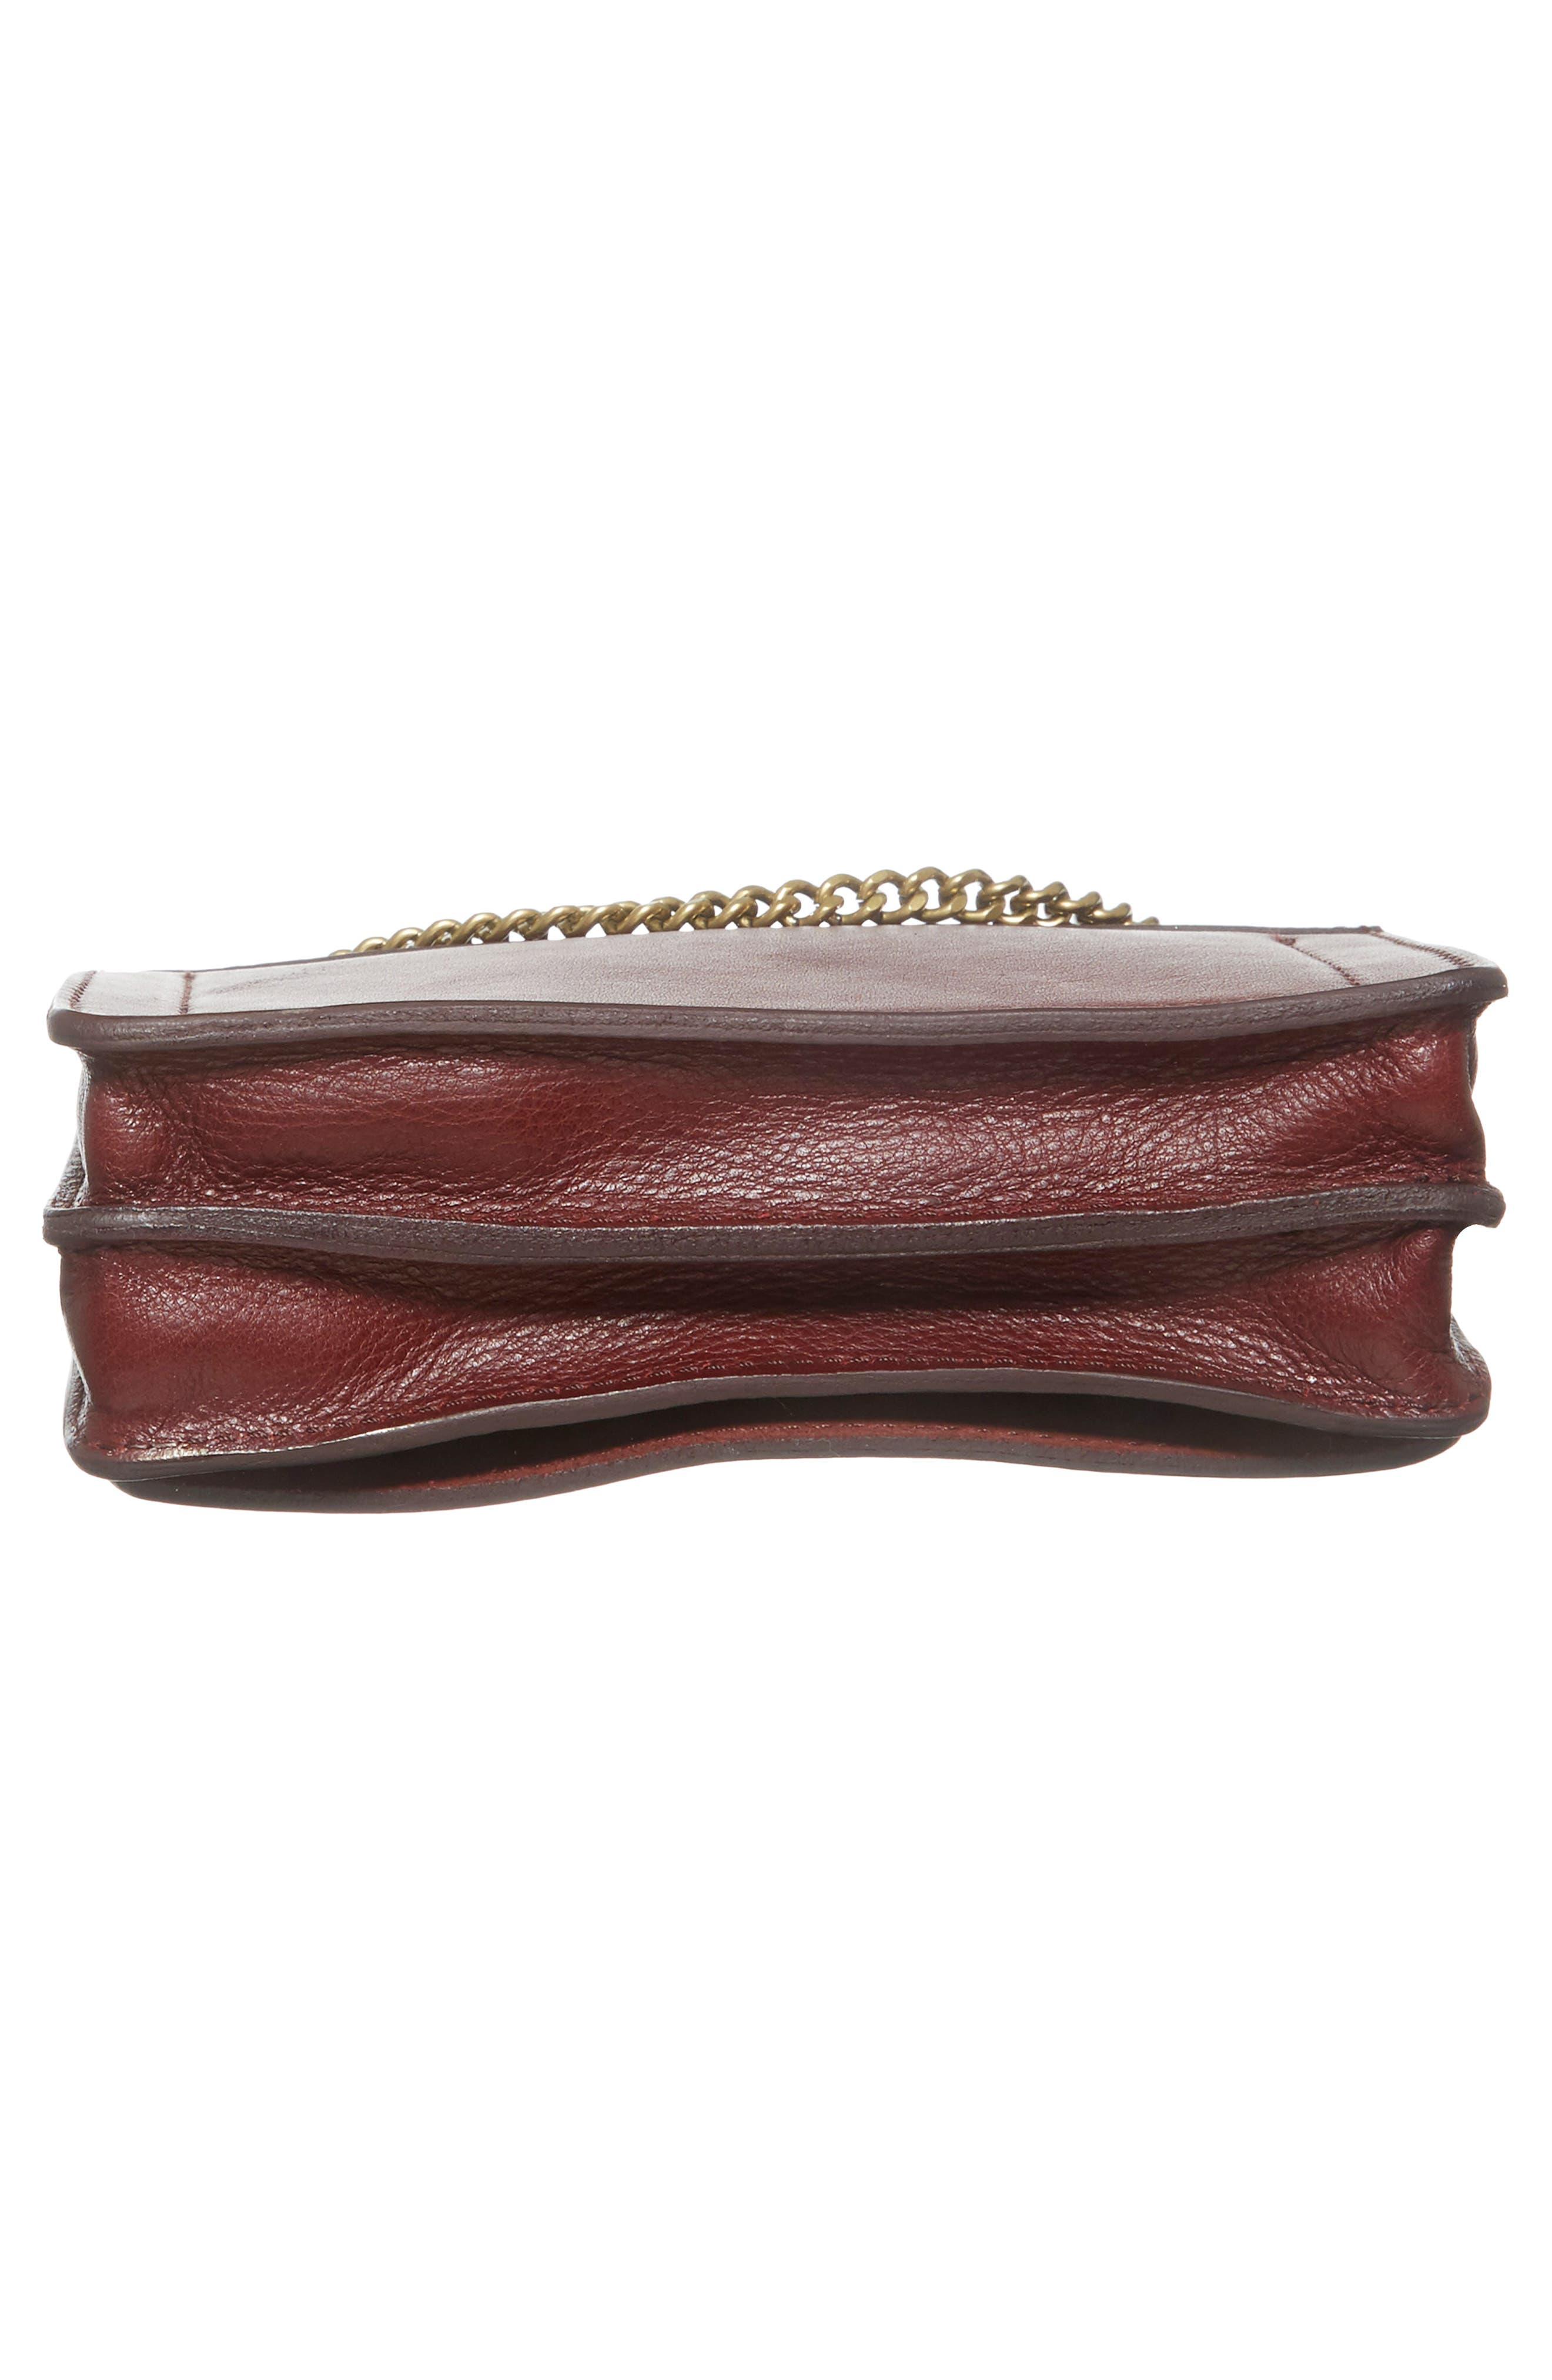 Chain Leather Crossbody Bag,                             Alternate thumbnail 6, color,                             Cabernet